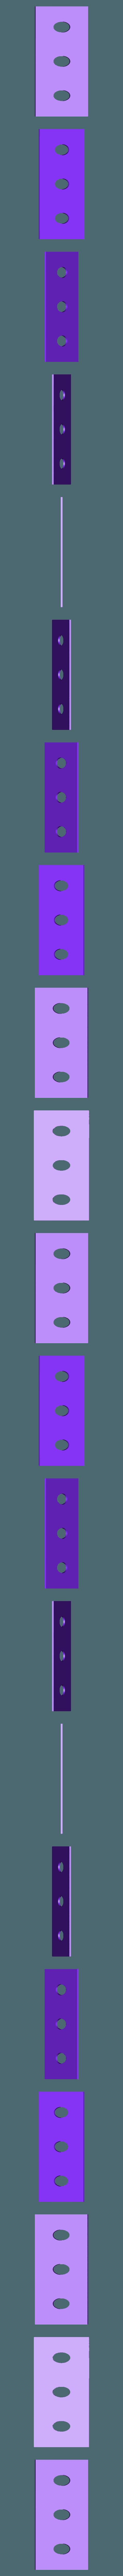 Entradas_de_ar.stl Download free STL file Projeto ANARC portable console with Raspberry PI • 3D printer template, CircuitoMaker